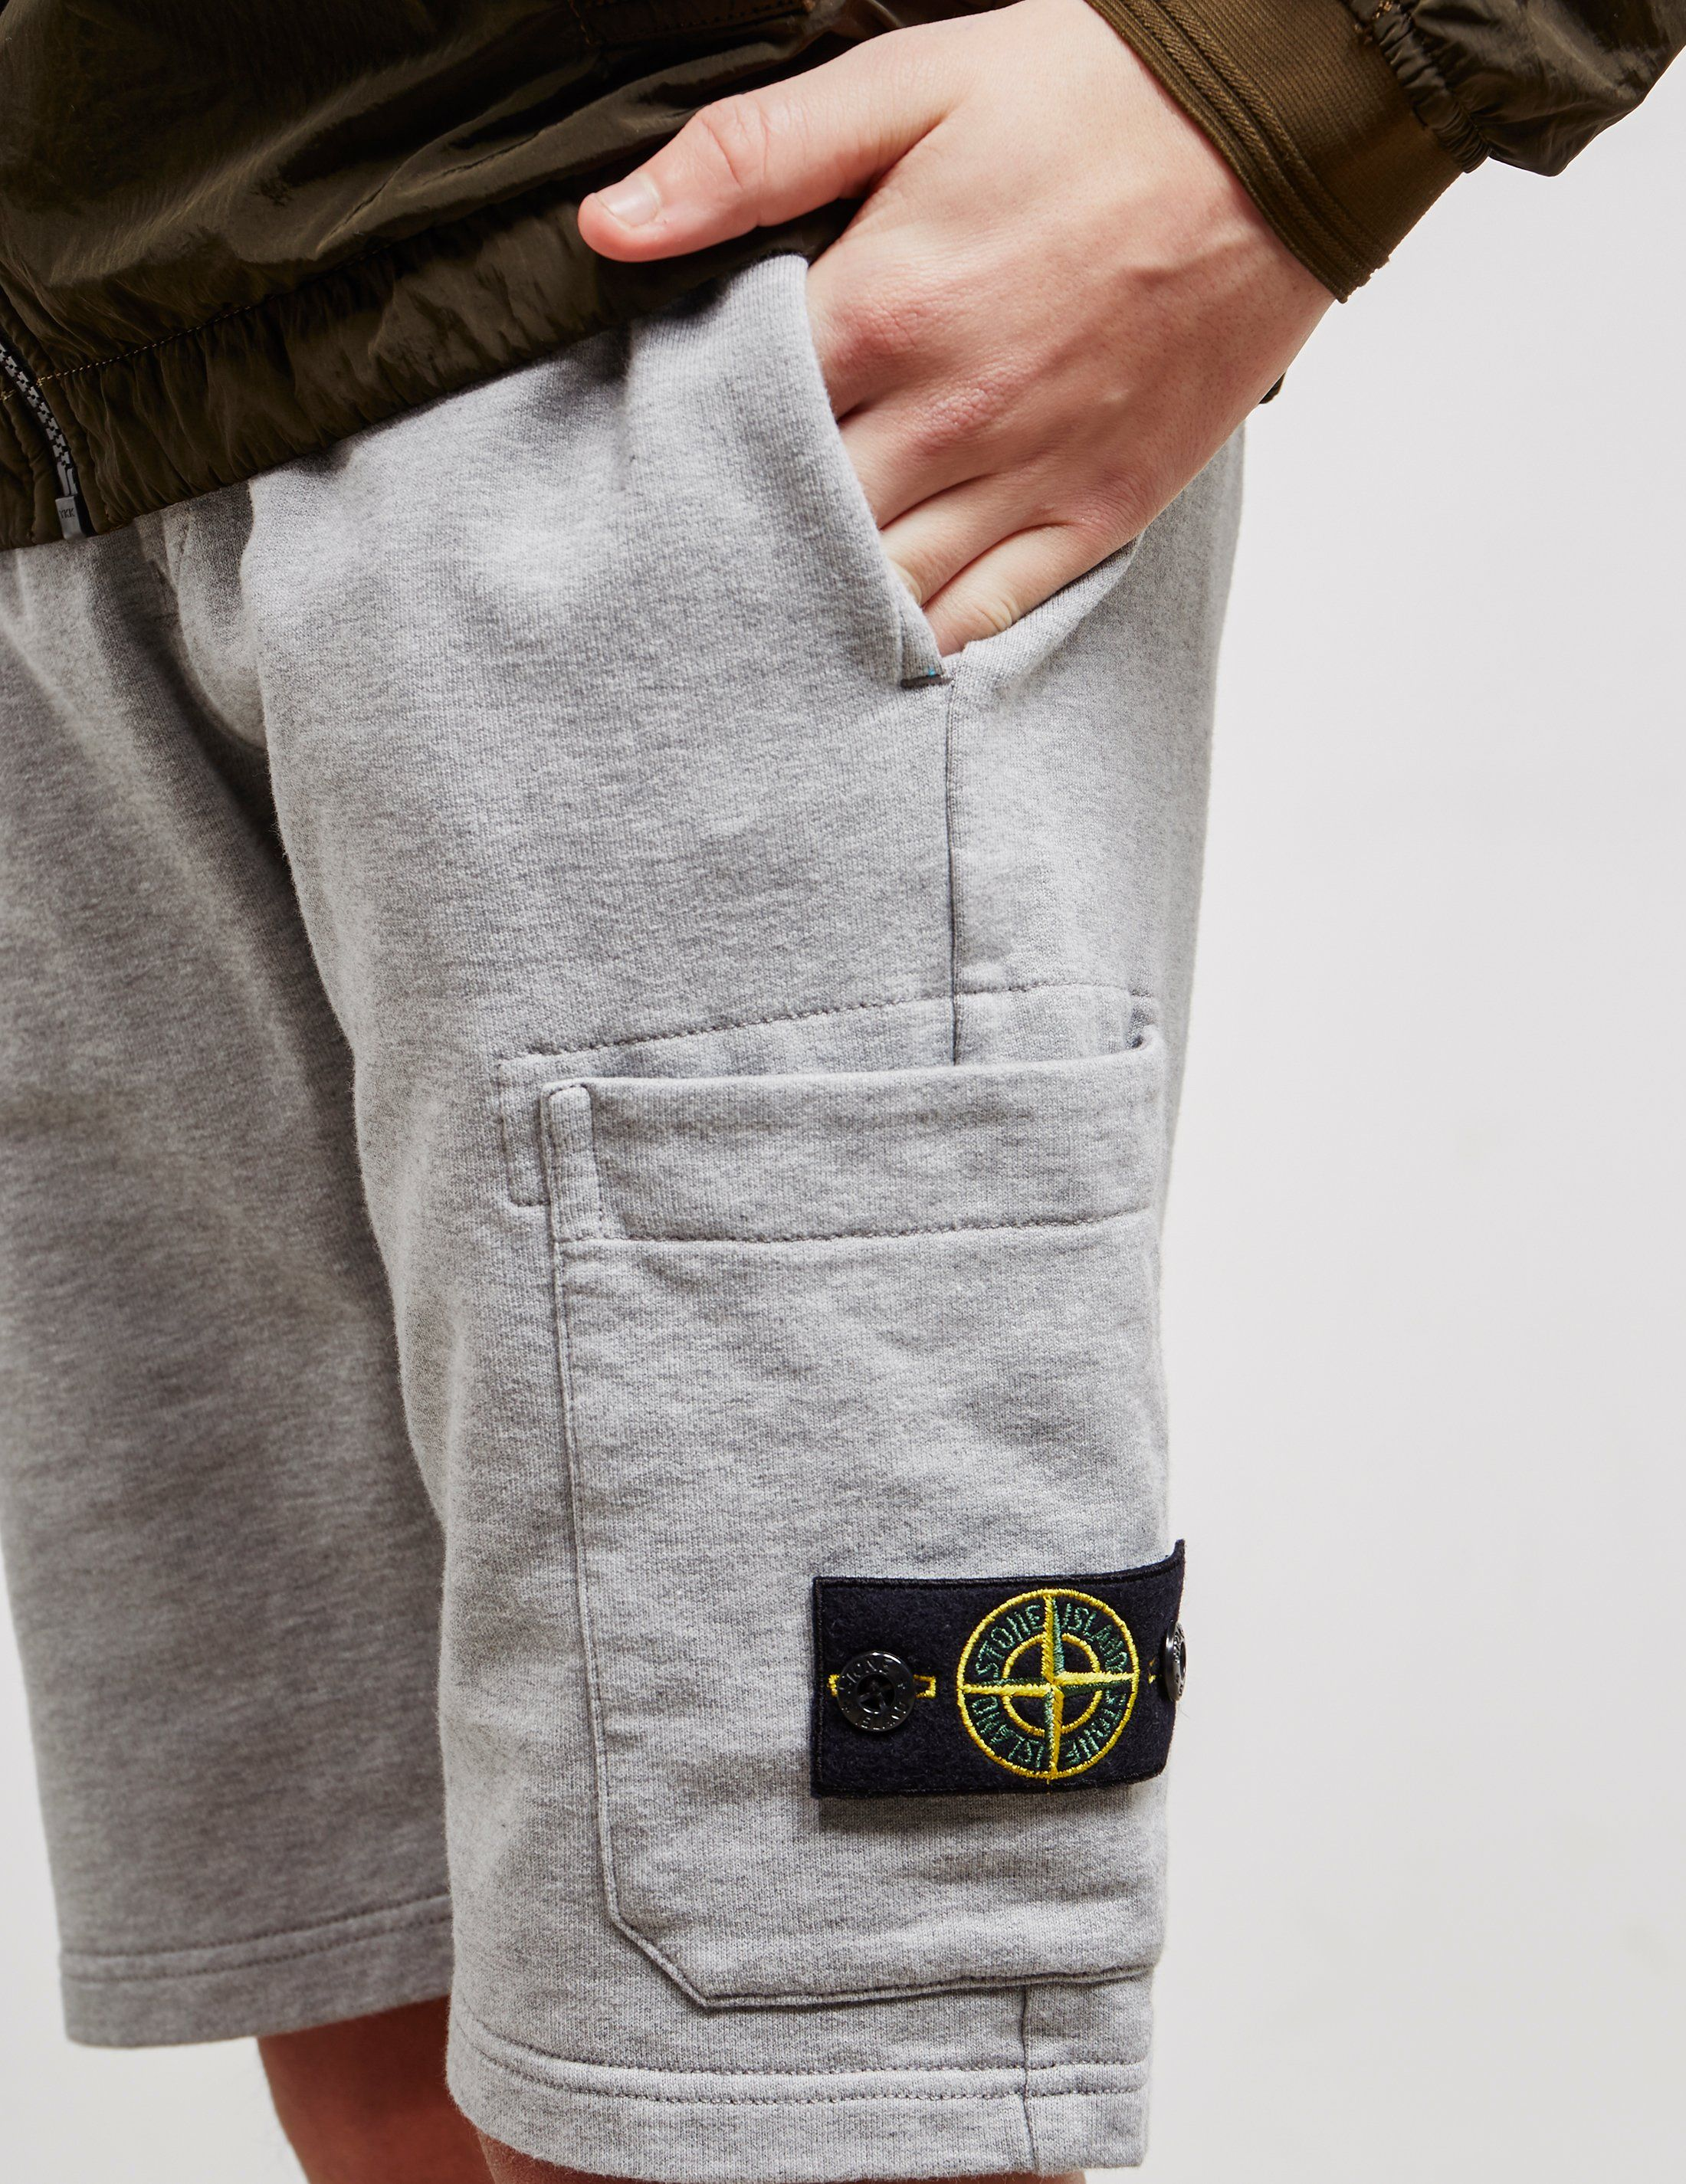 Stone Island Patch Shorts